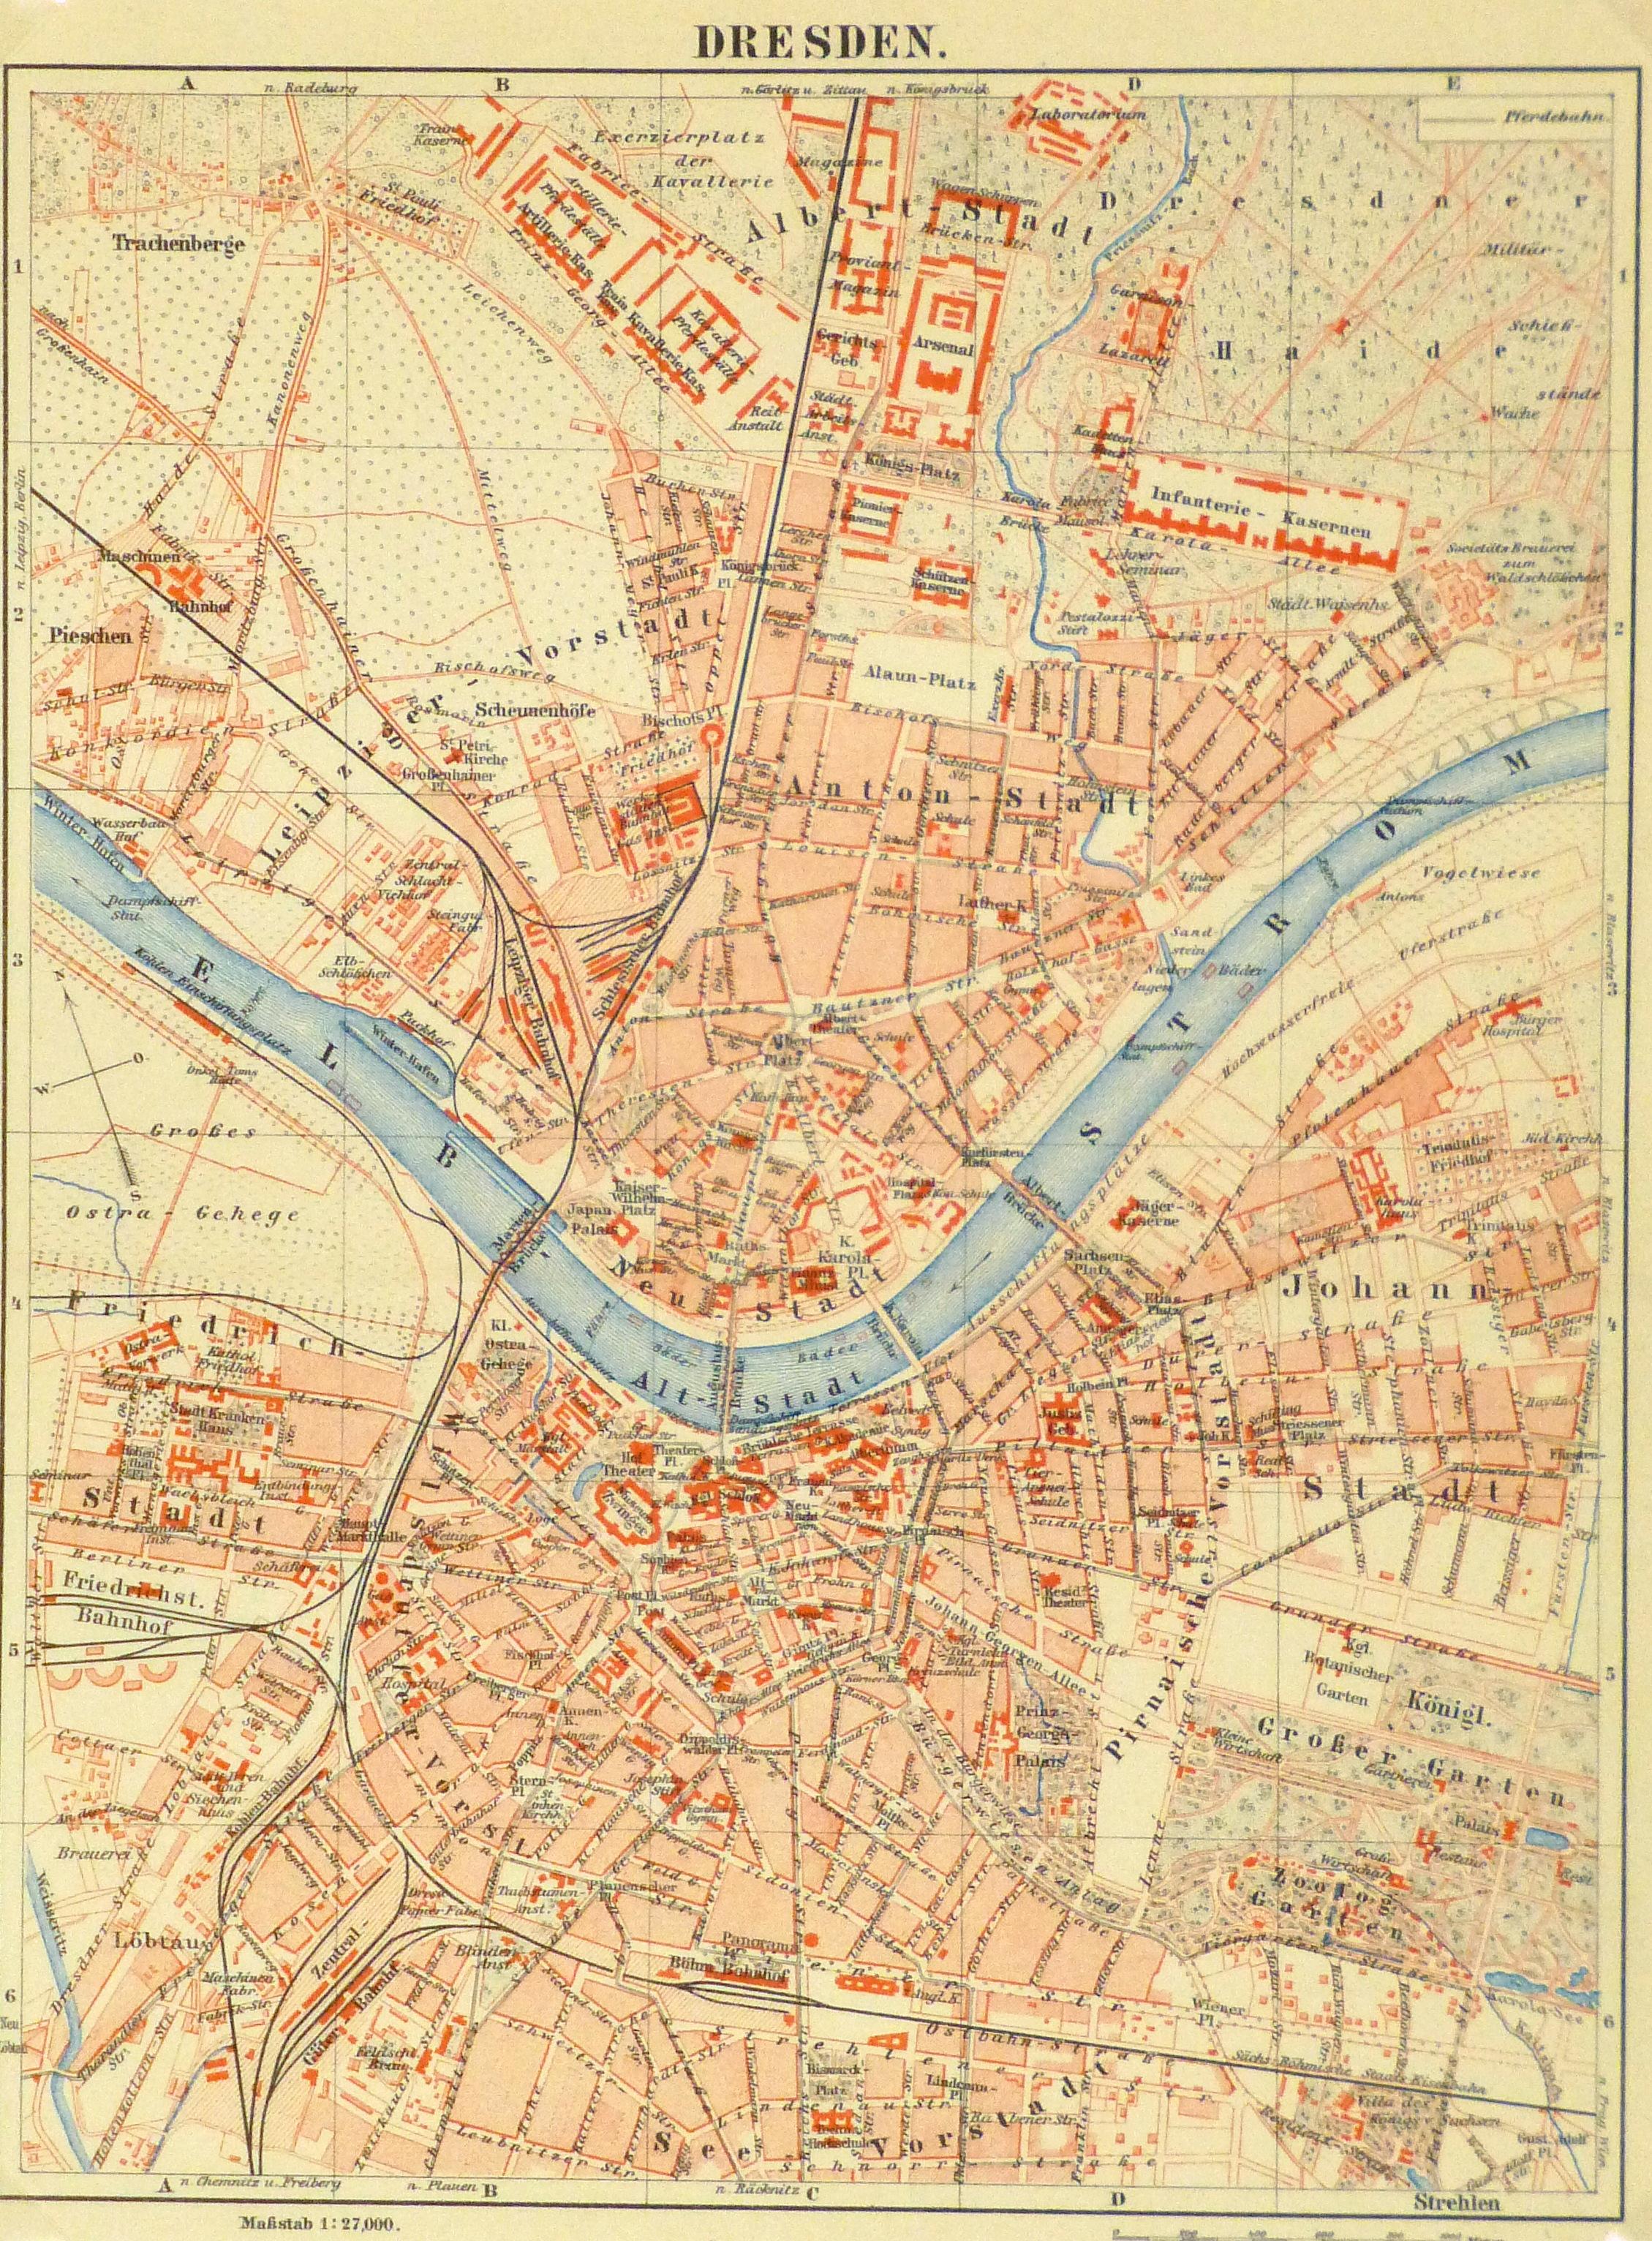 Map of Dresden Germany, Circa 1885-main-8816K